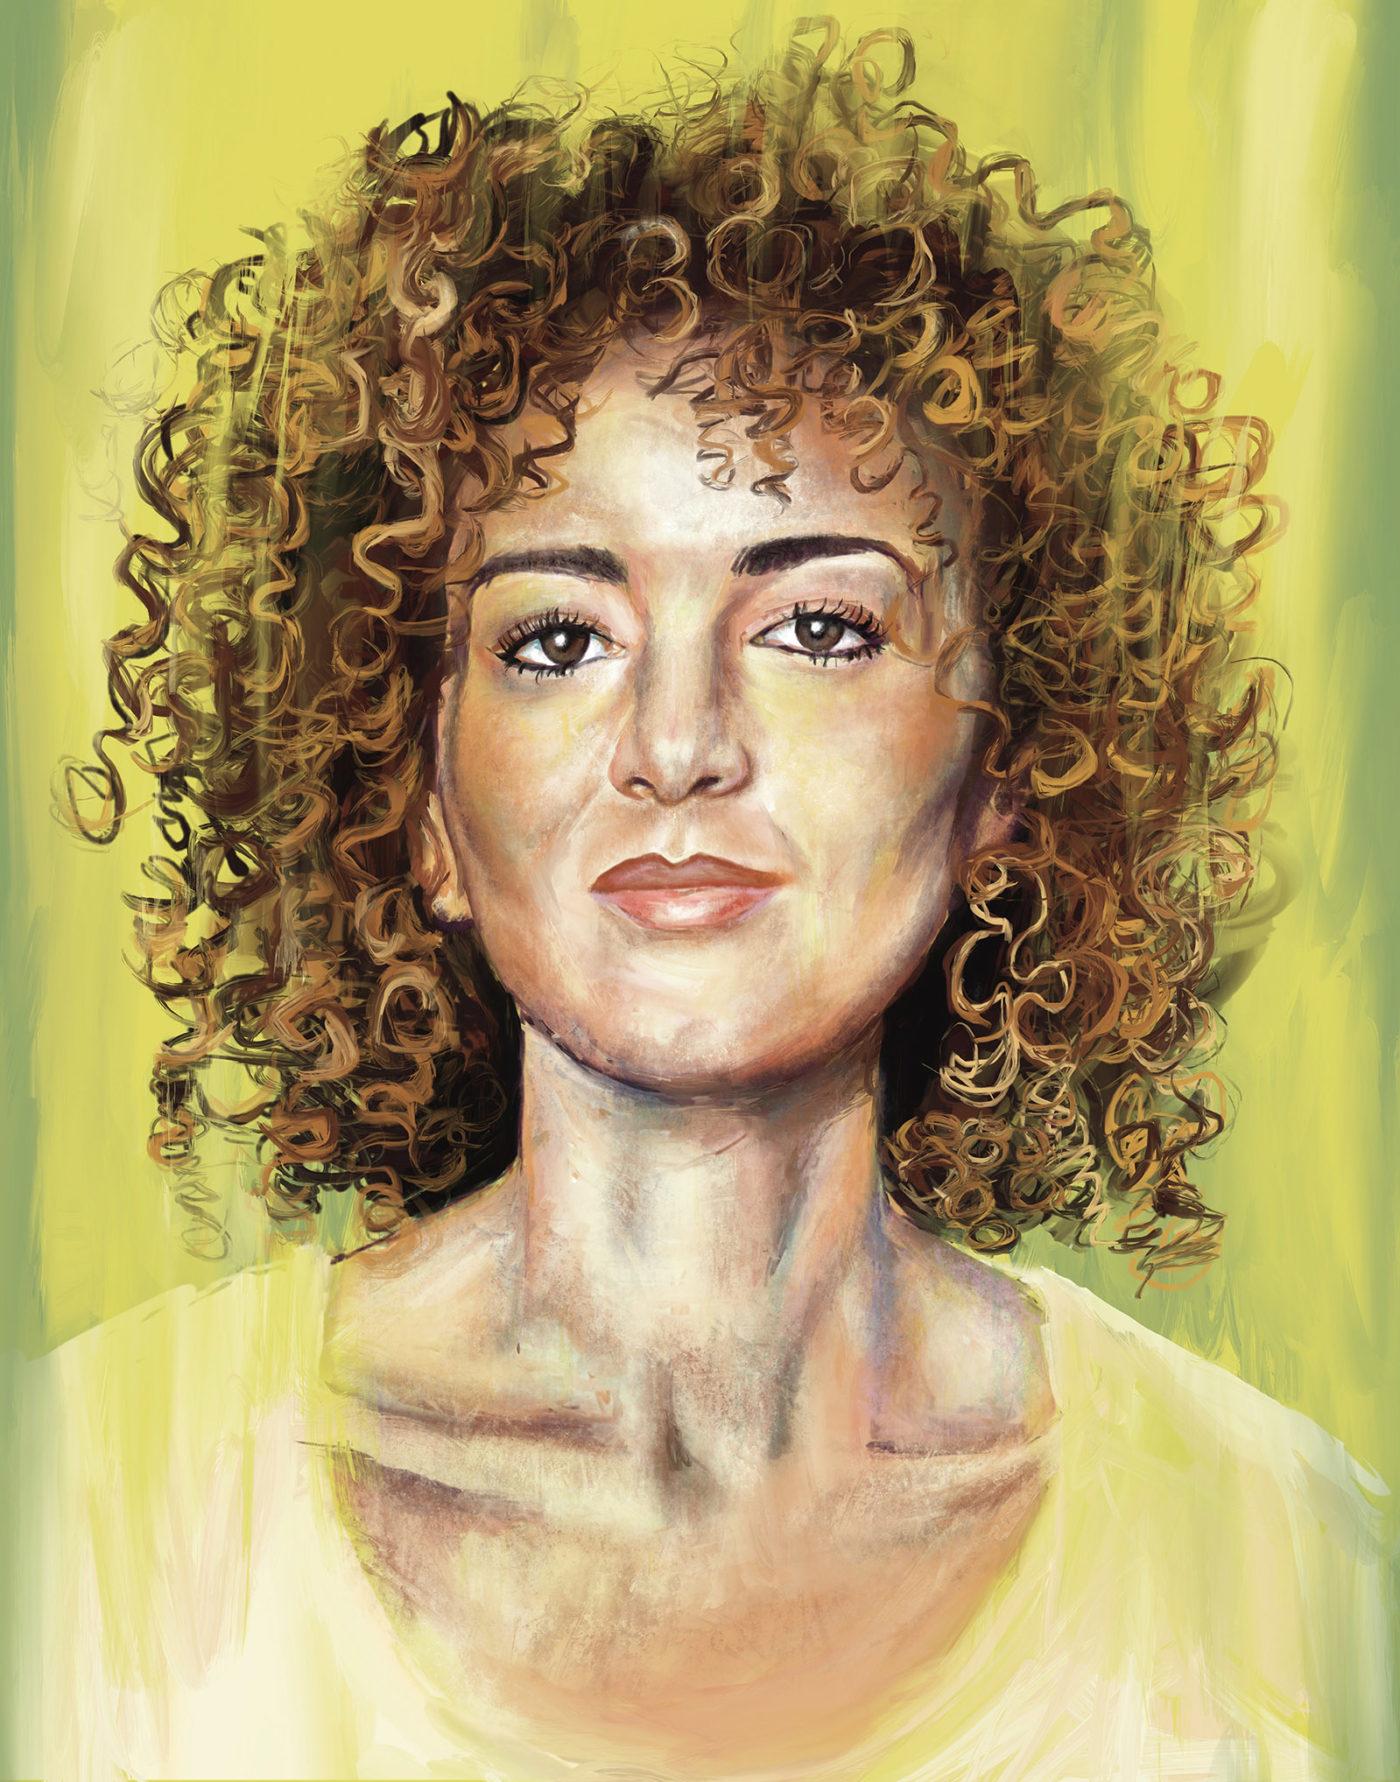 Leila Slimani; illustration by Johnalynn Holland